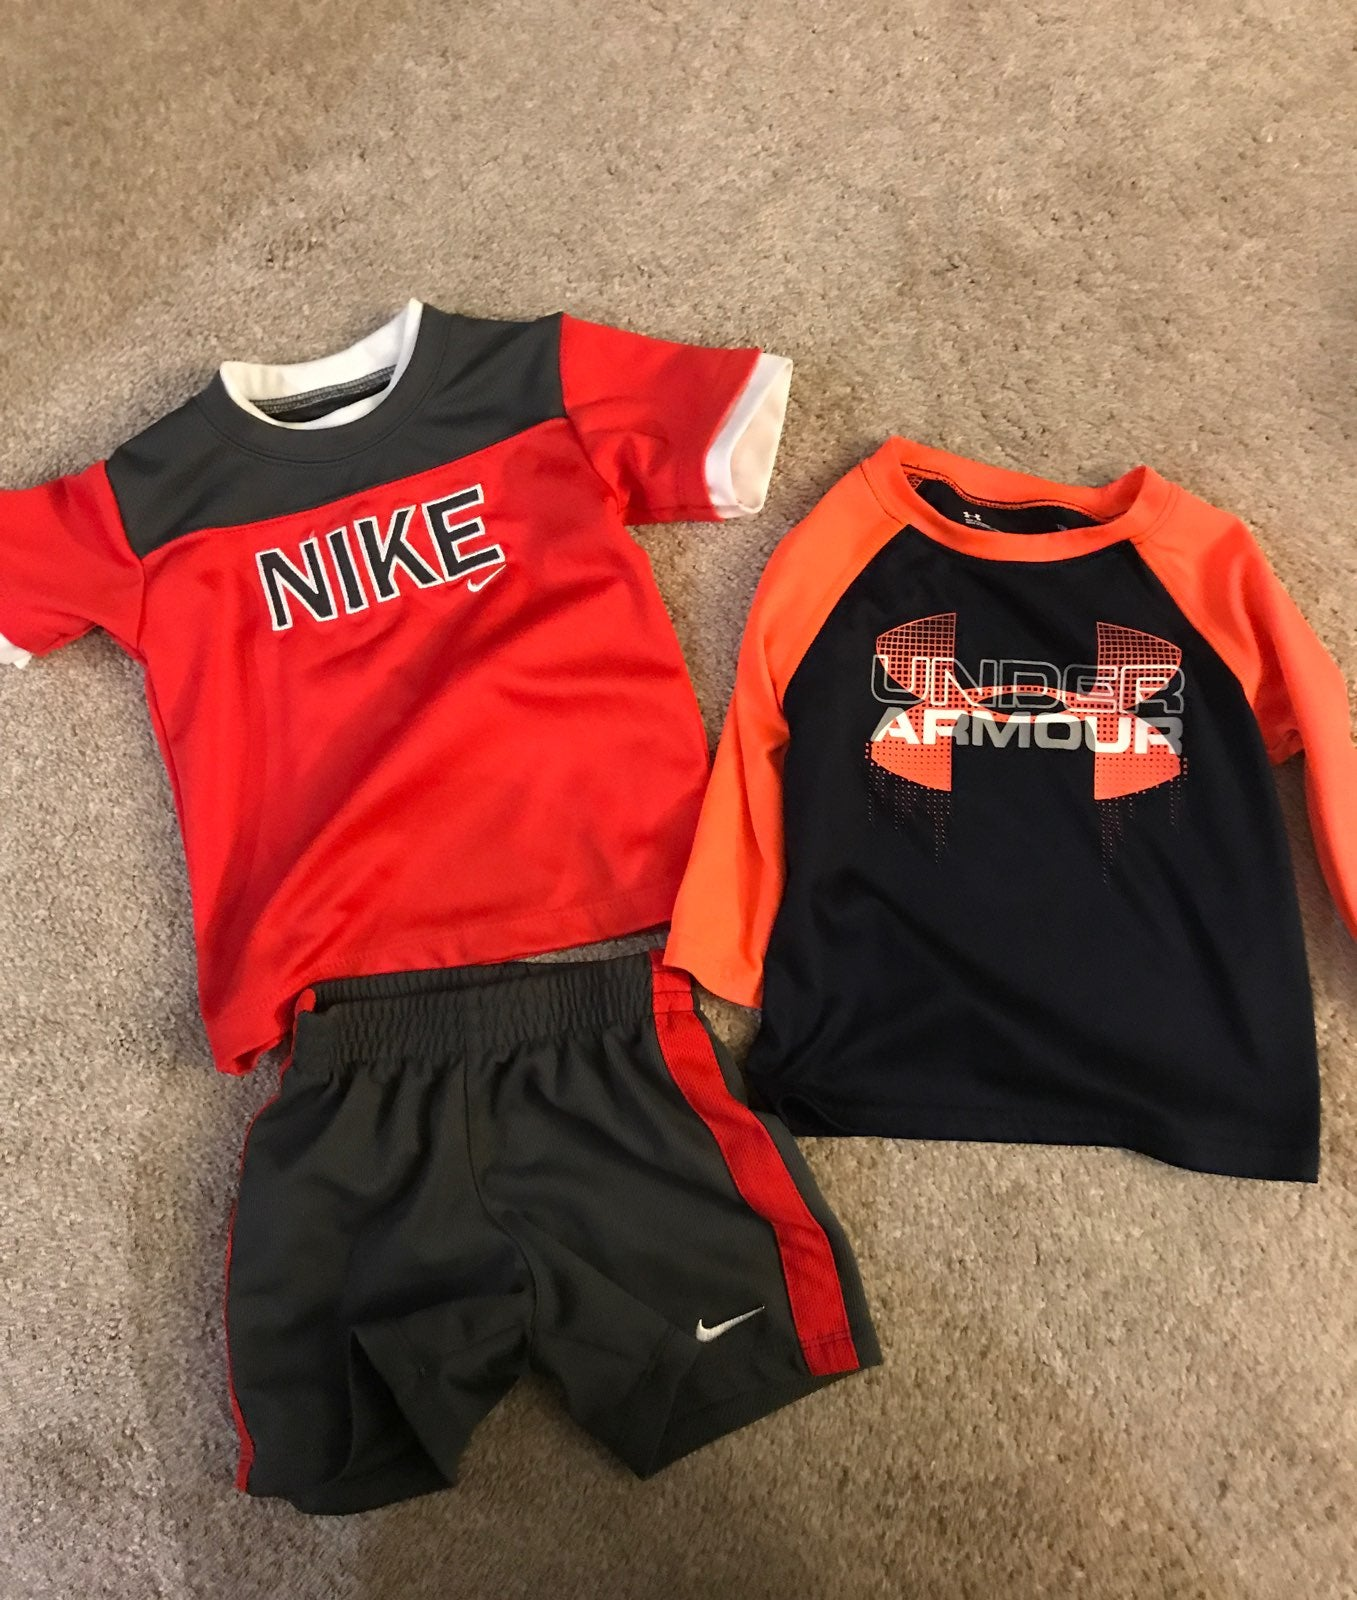 Nike/under armour